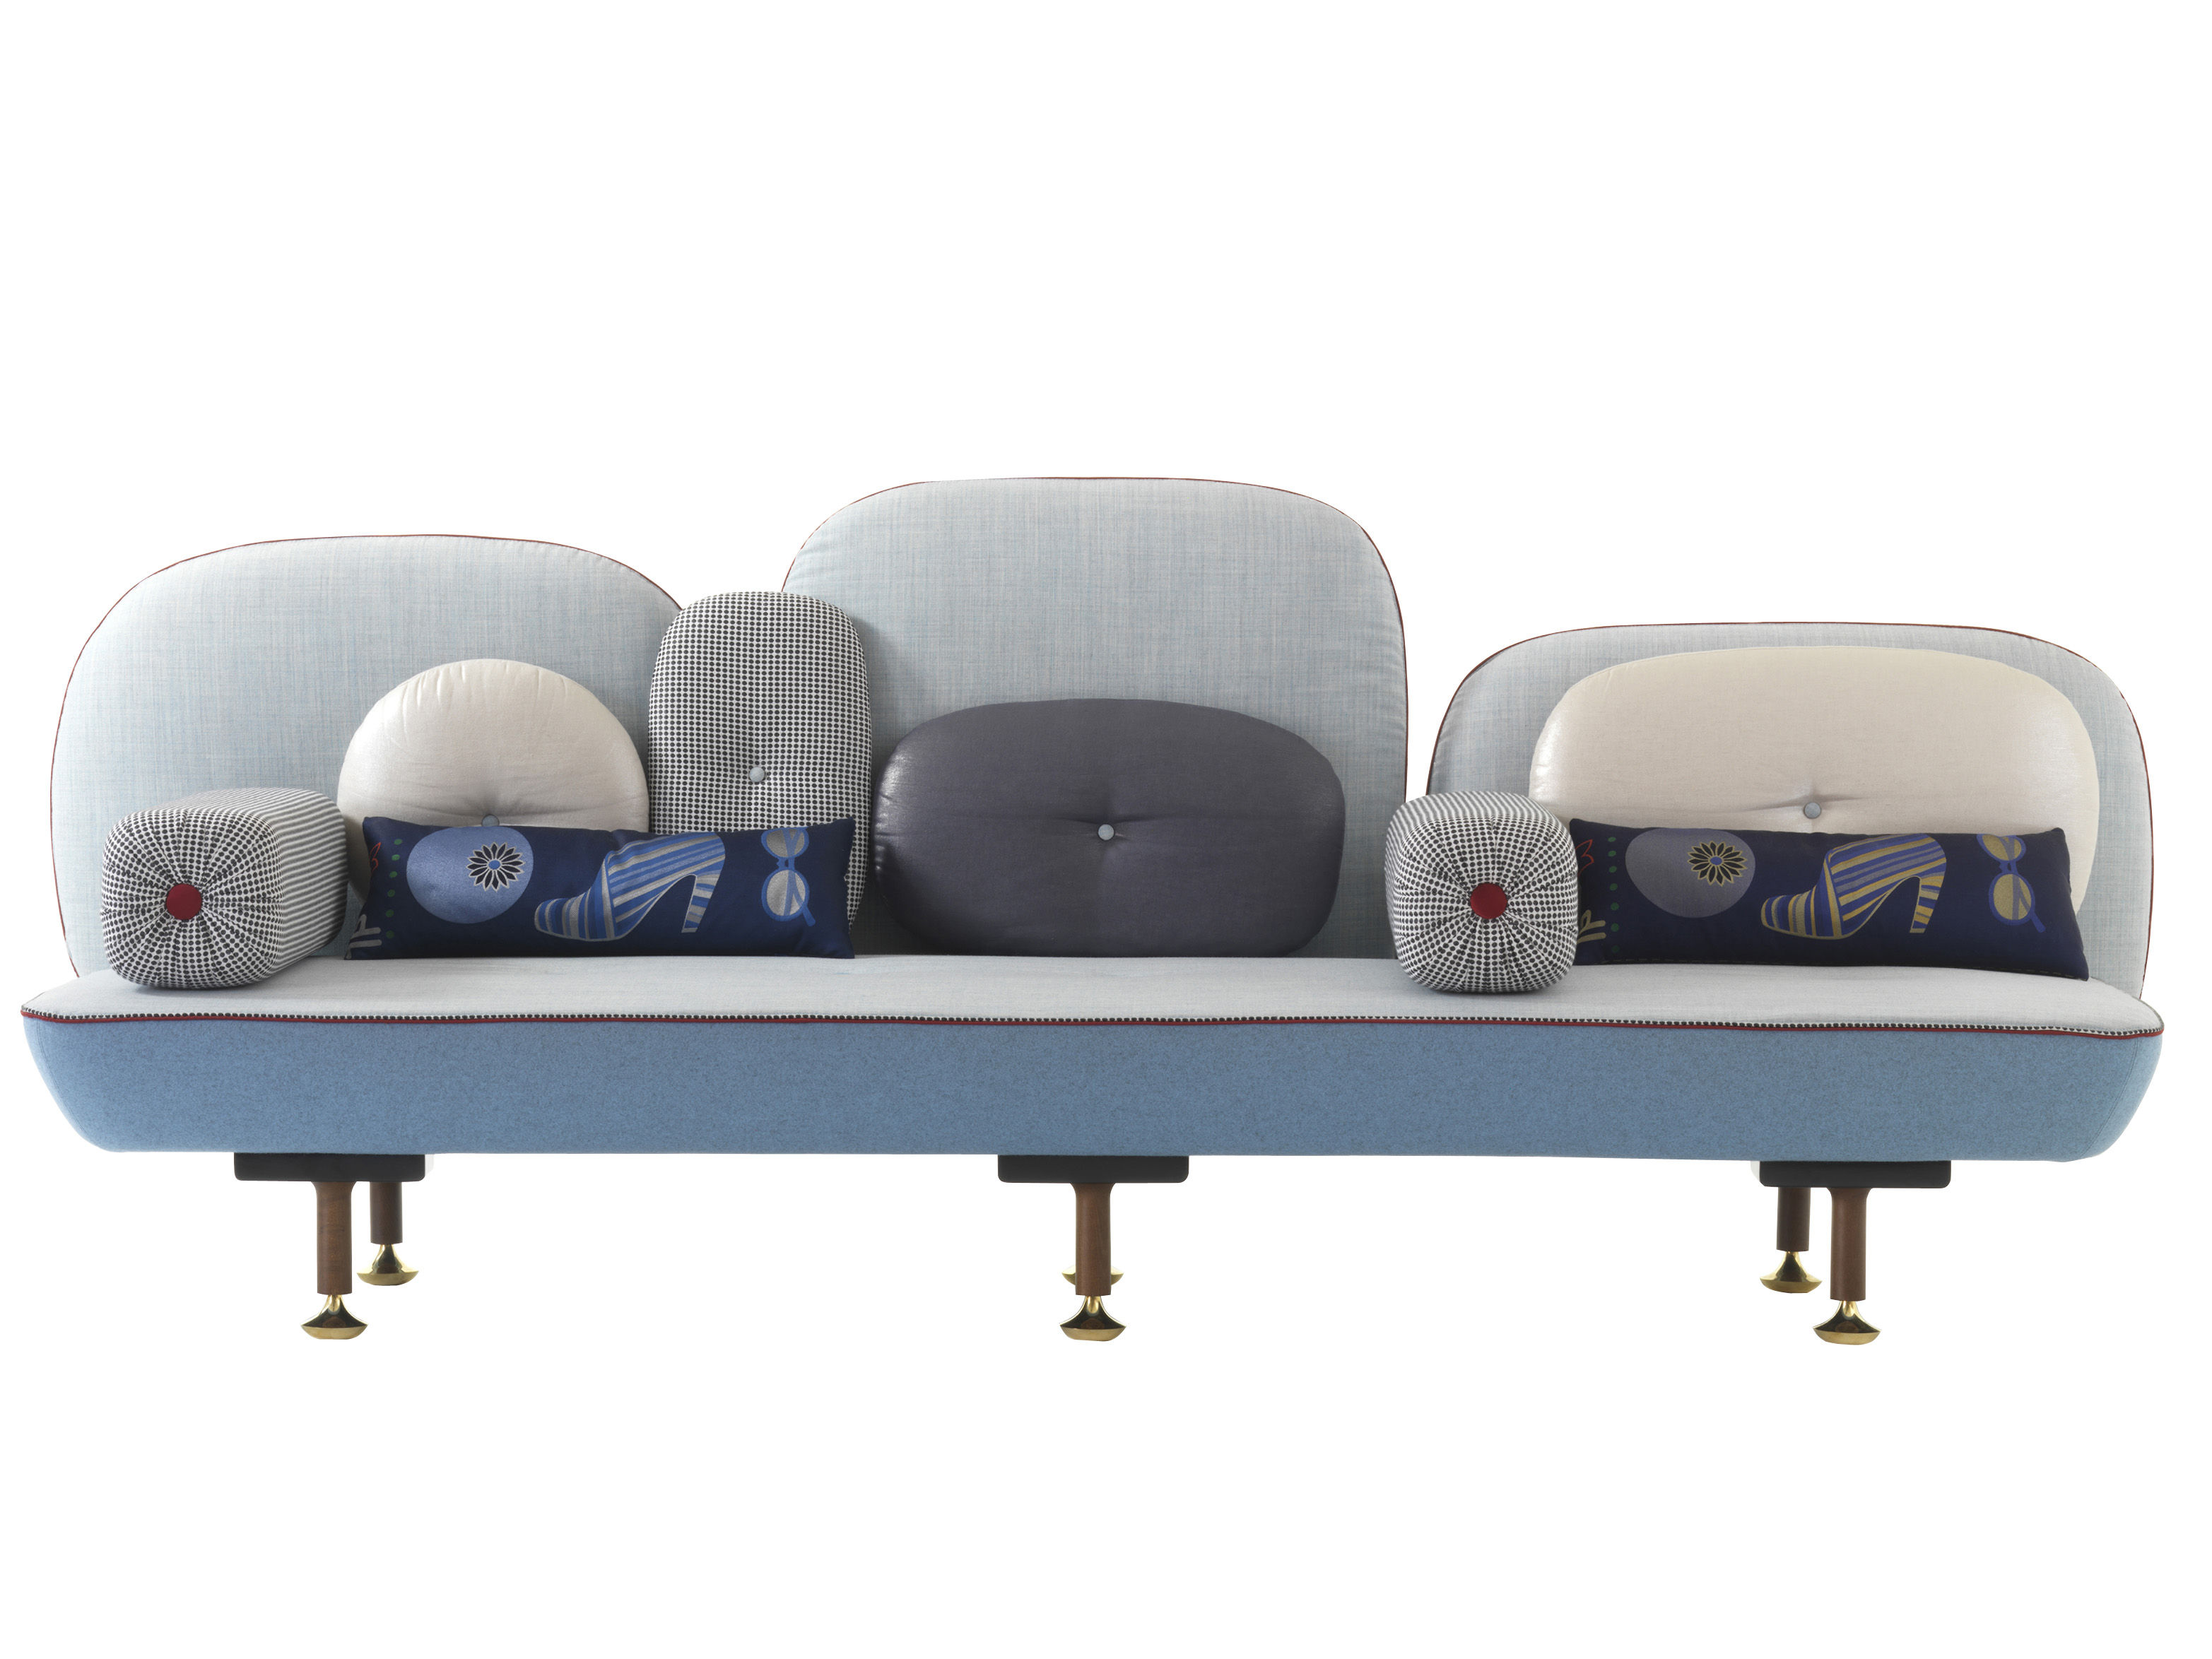 Möbel - Sofas - My Beautiful Backside Sofa L 261 cm - Moroso - Helles Blau - Metall, Nussbaum, Wolle